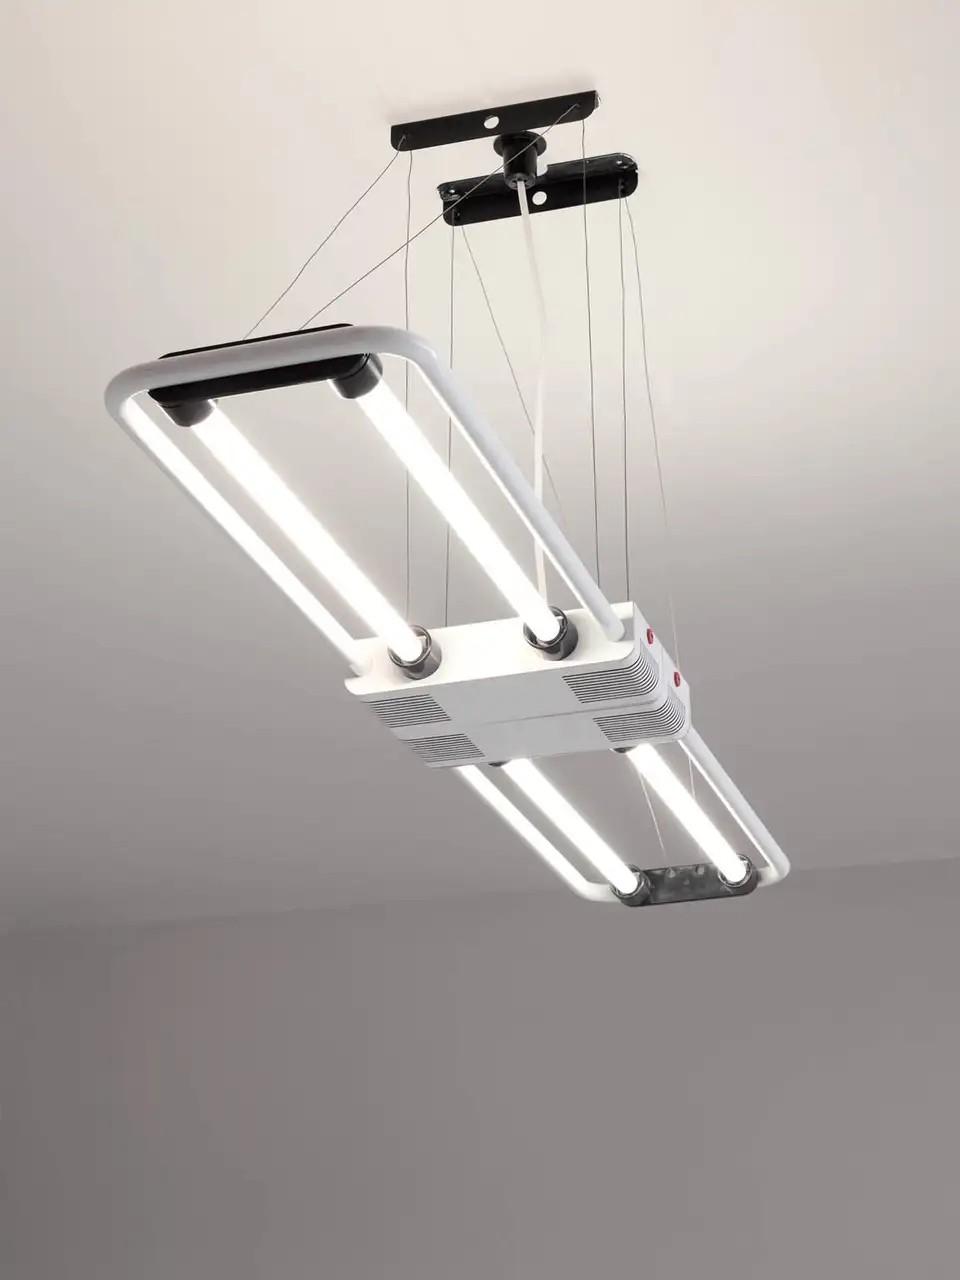 XXL Vintage Fluorescent Hanging Lamp 'Duo' by Gian Nicola Gigante for ZerbettoXXL Vintage Fluorescent Hanging Lamp 'Duo' by Gian Nicola Gigante for Zerbetto